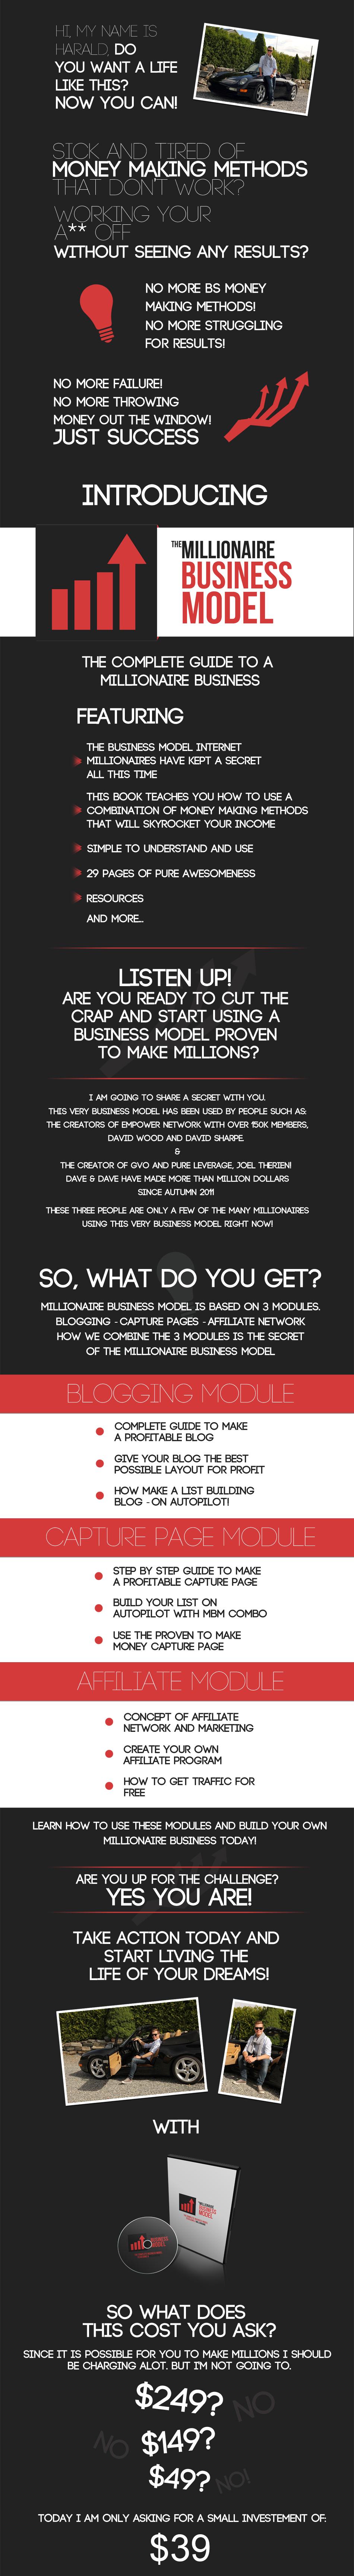 Poster-Millionaire Business Model